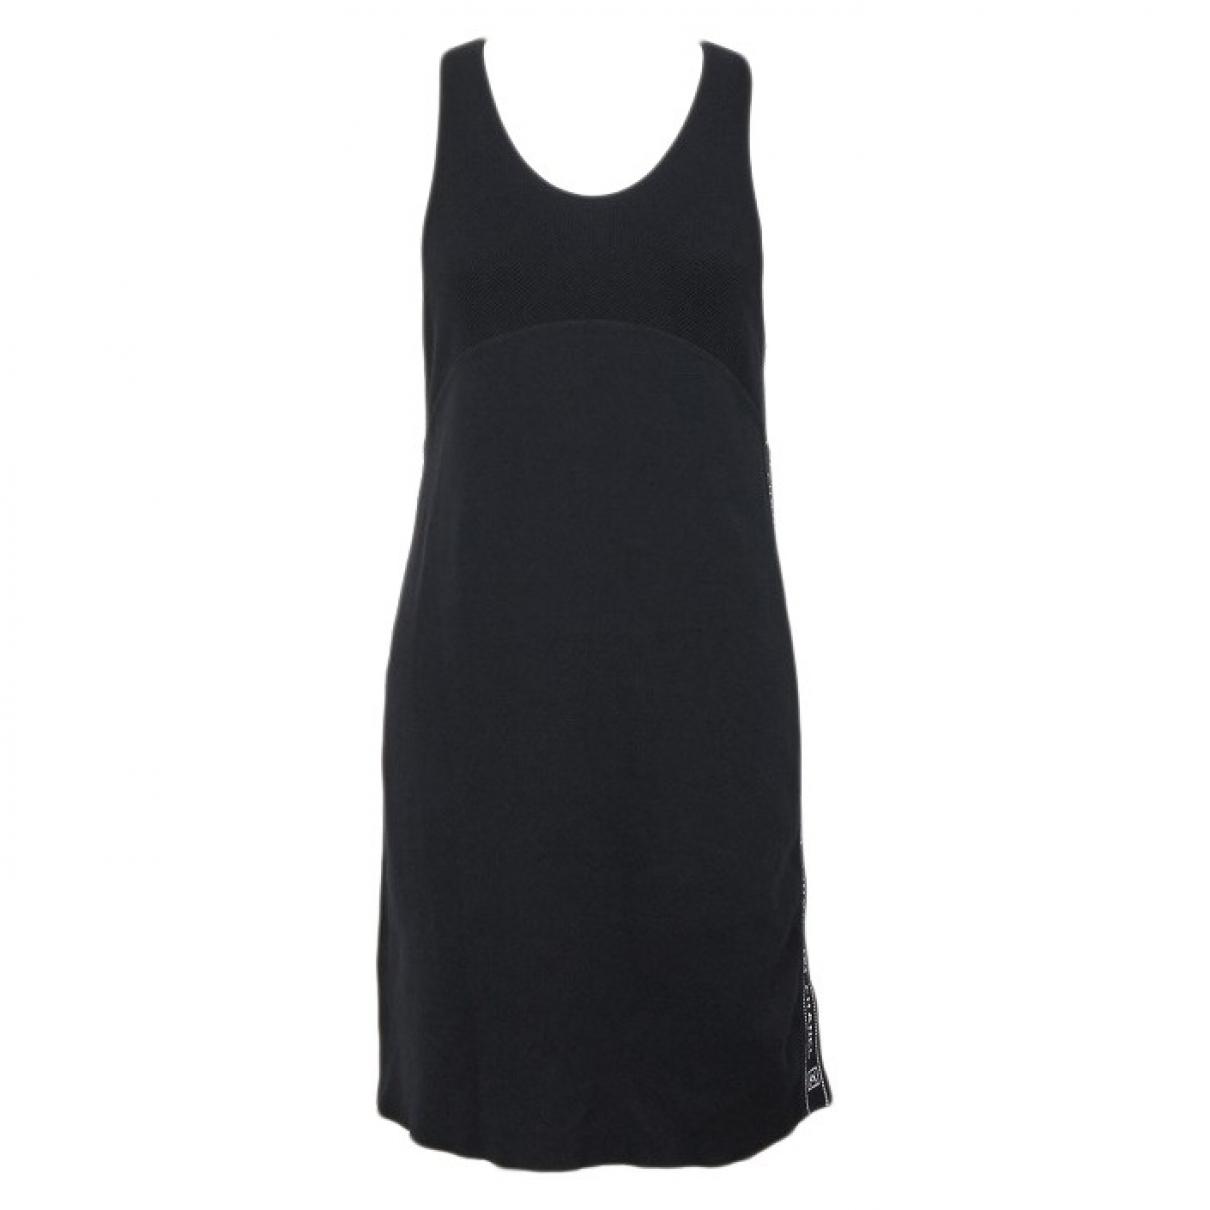 Chanel \N Black Cotton dress for Women 38 FR